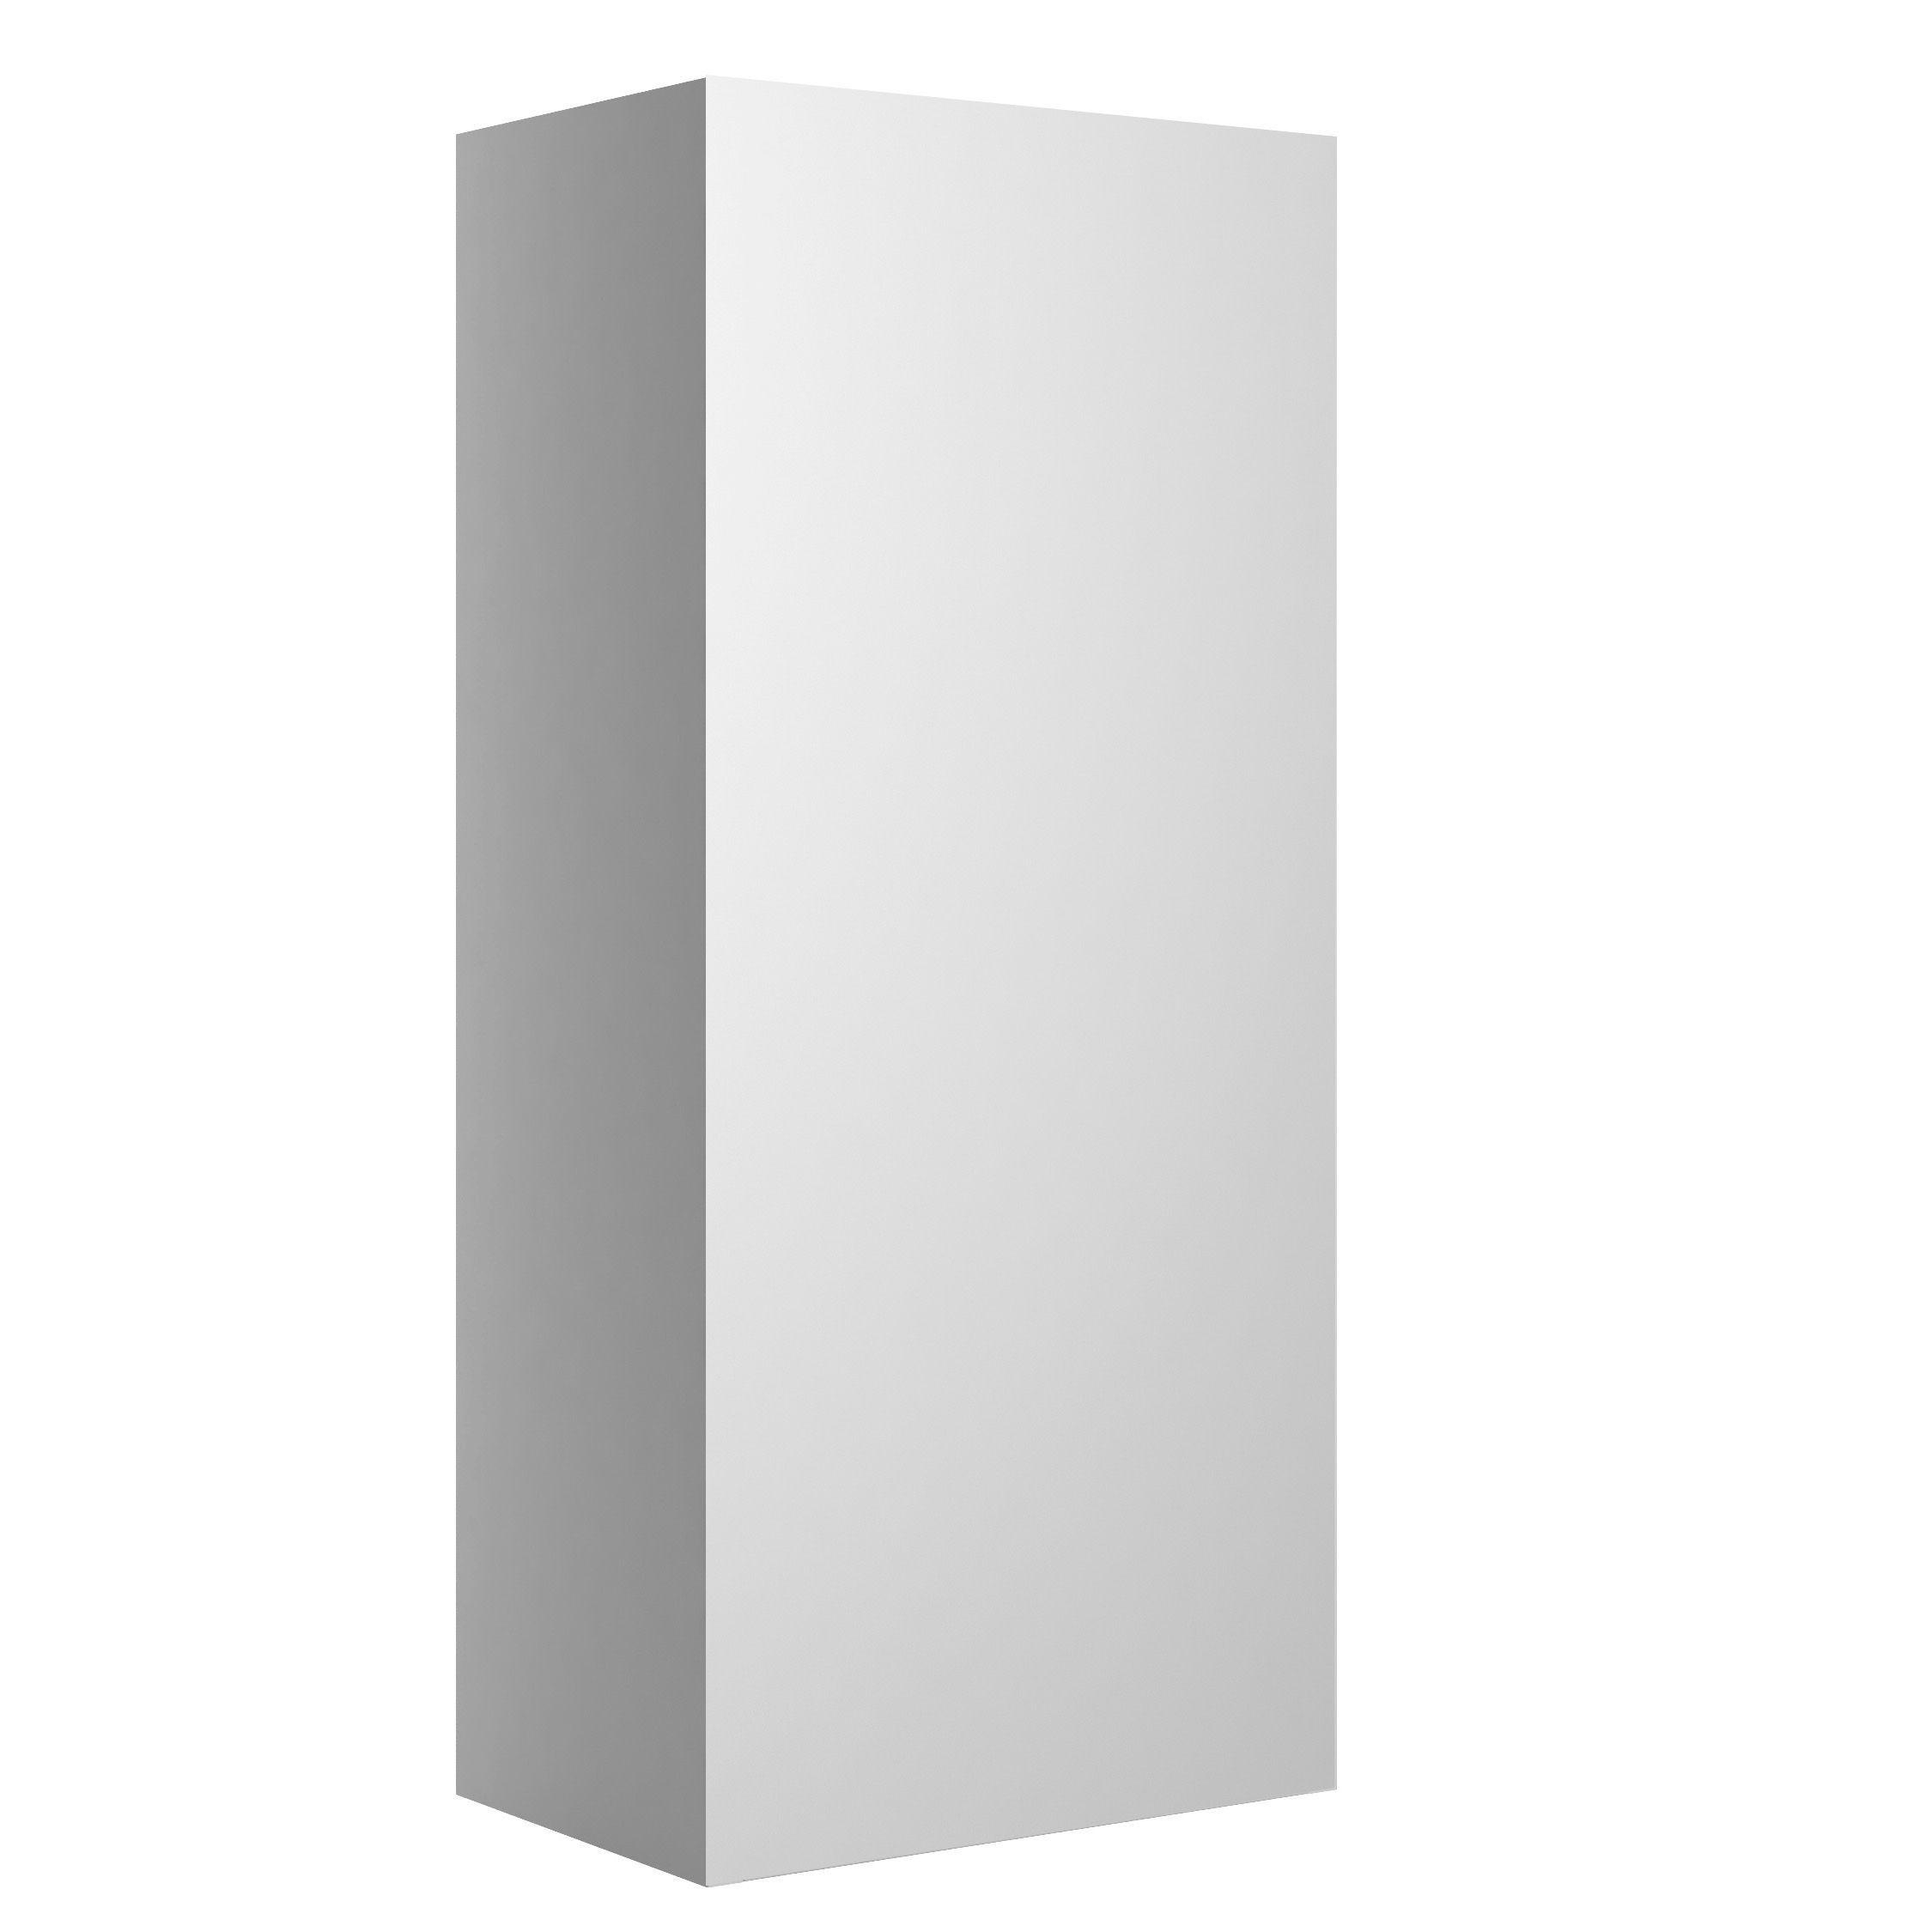 Cooke Amp Lewis Santini Gloss White Single Door Wall Cabinet